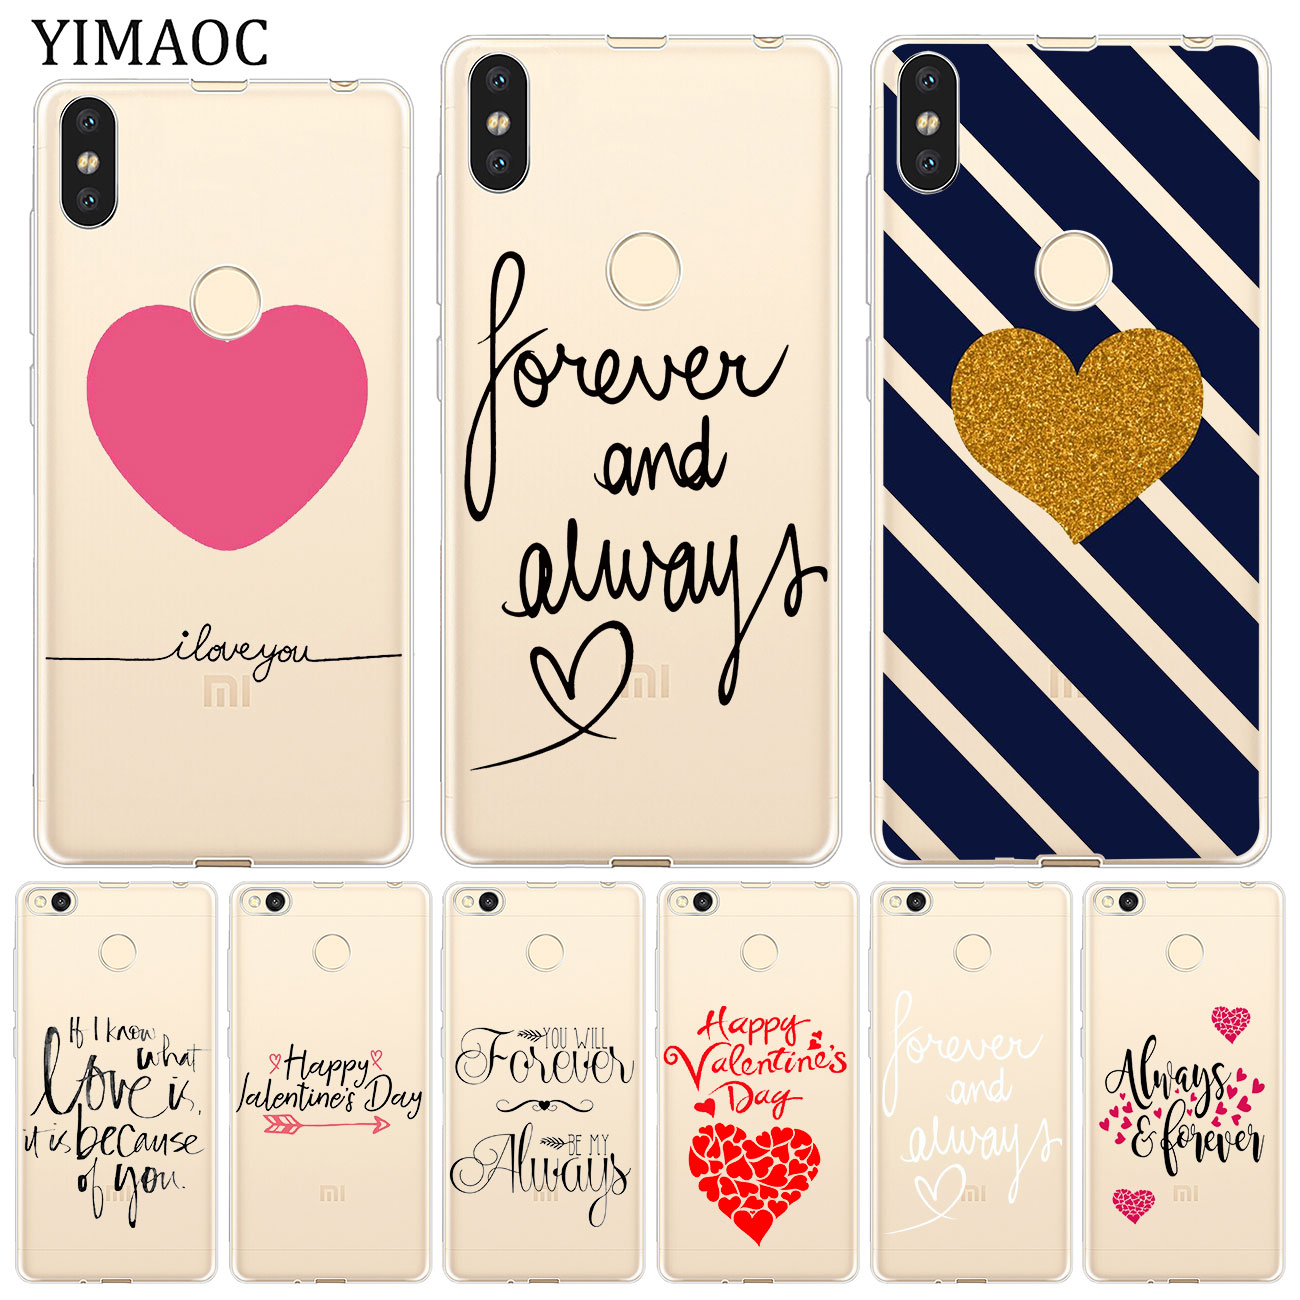 YIMAOC forever always Valentine's Day Soft Case for Xiaomi Mi 9 9T CC9 CC9E A3 Pro 8 SE A2 Lite A1 M